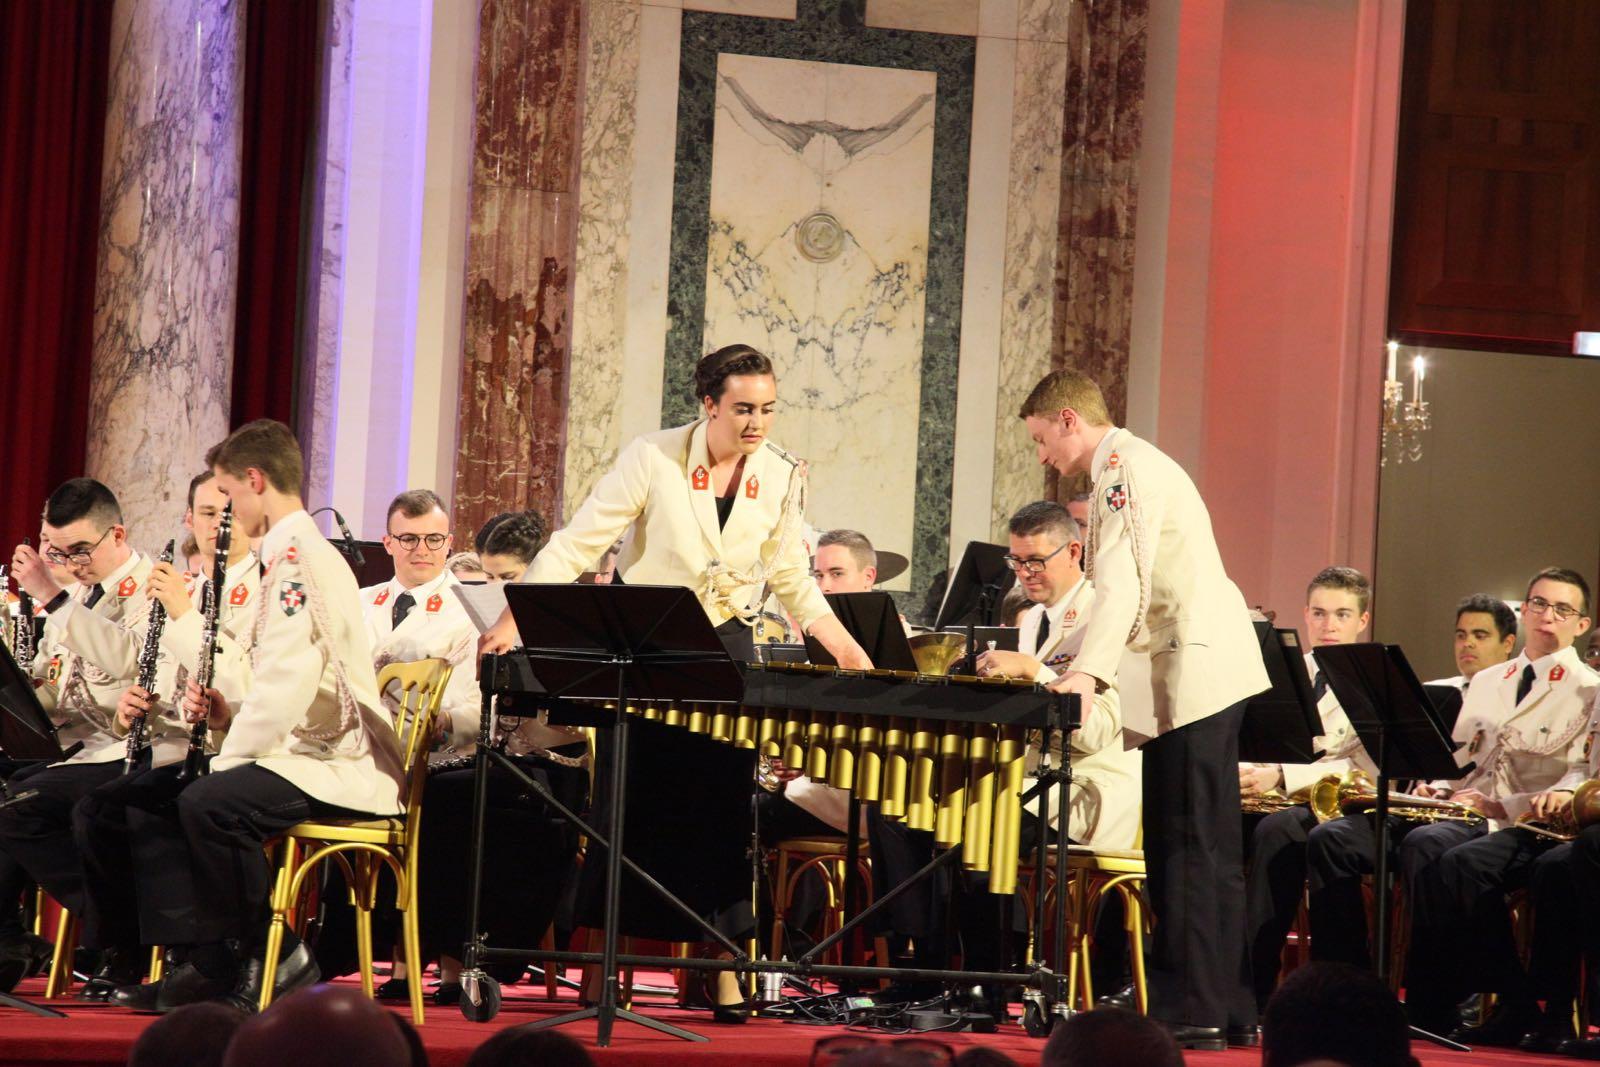 2019_03_14Gardemusik_Frühjahrskonzert_HBP_Hofburg - 109 of 177